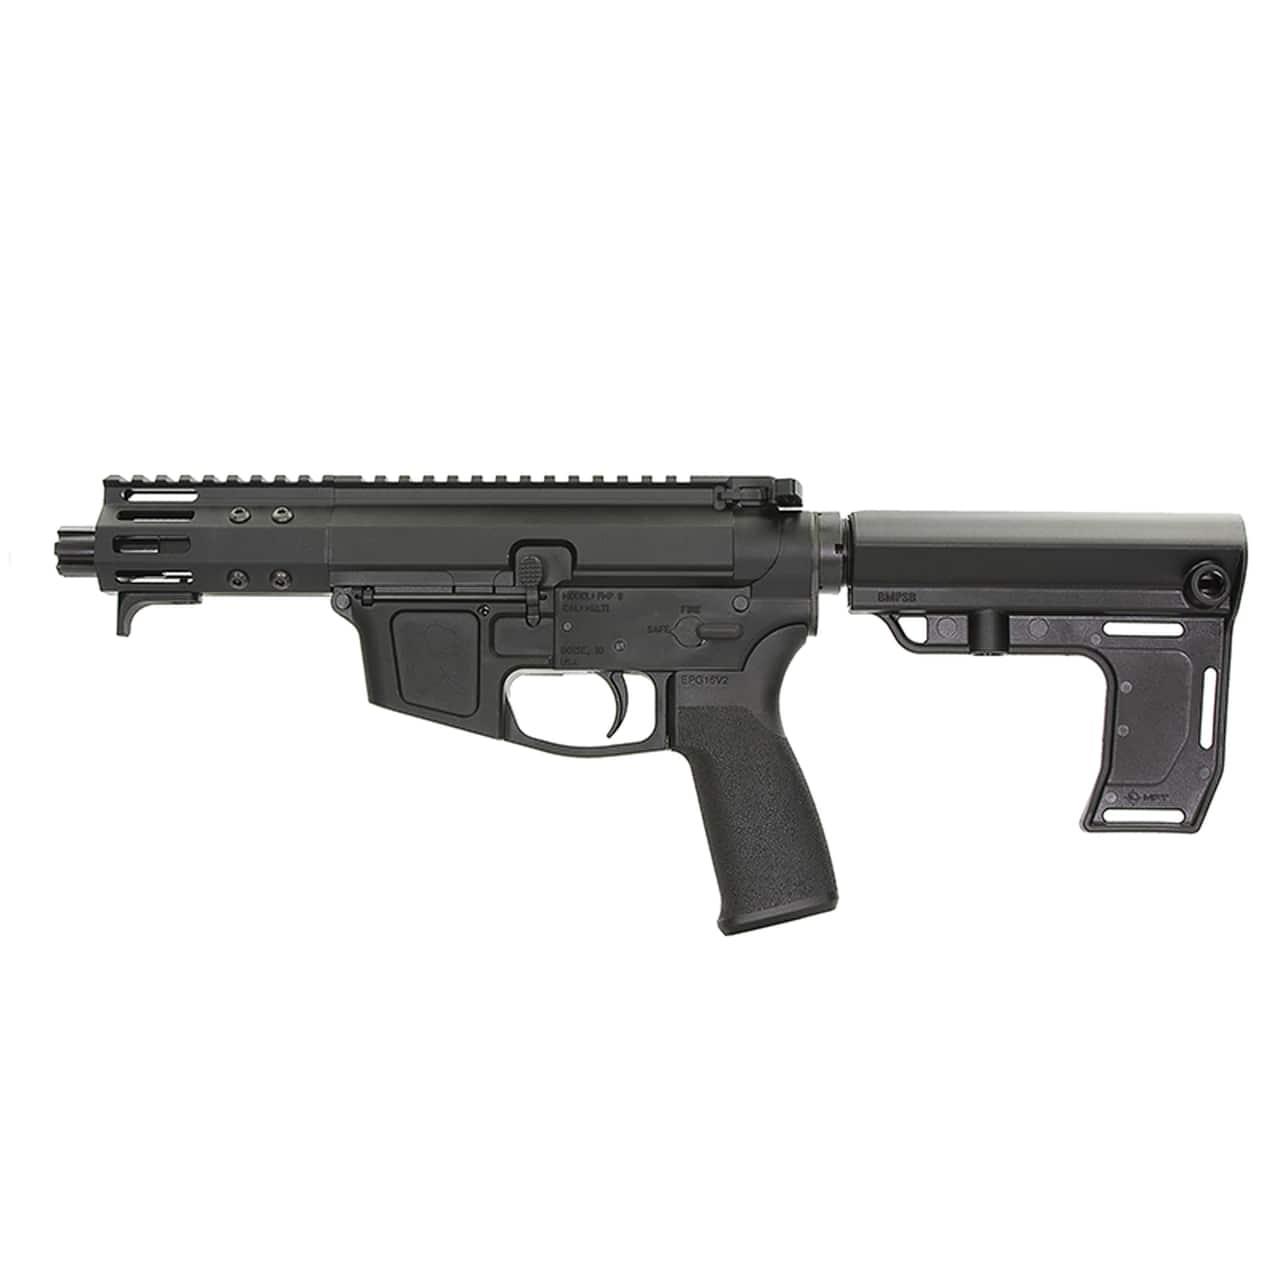 Image of FOXTROT MIKE PRODUCTS FM9 Billet 9mm AR15 Pistol